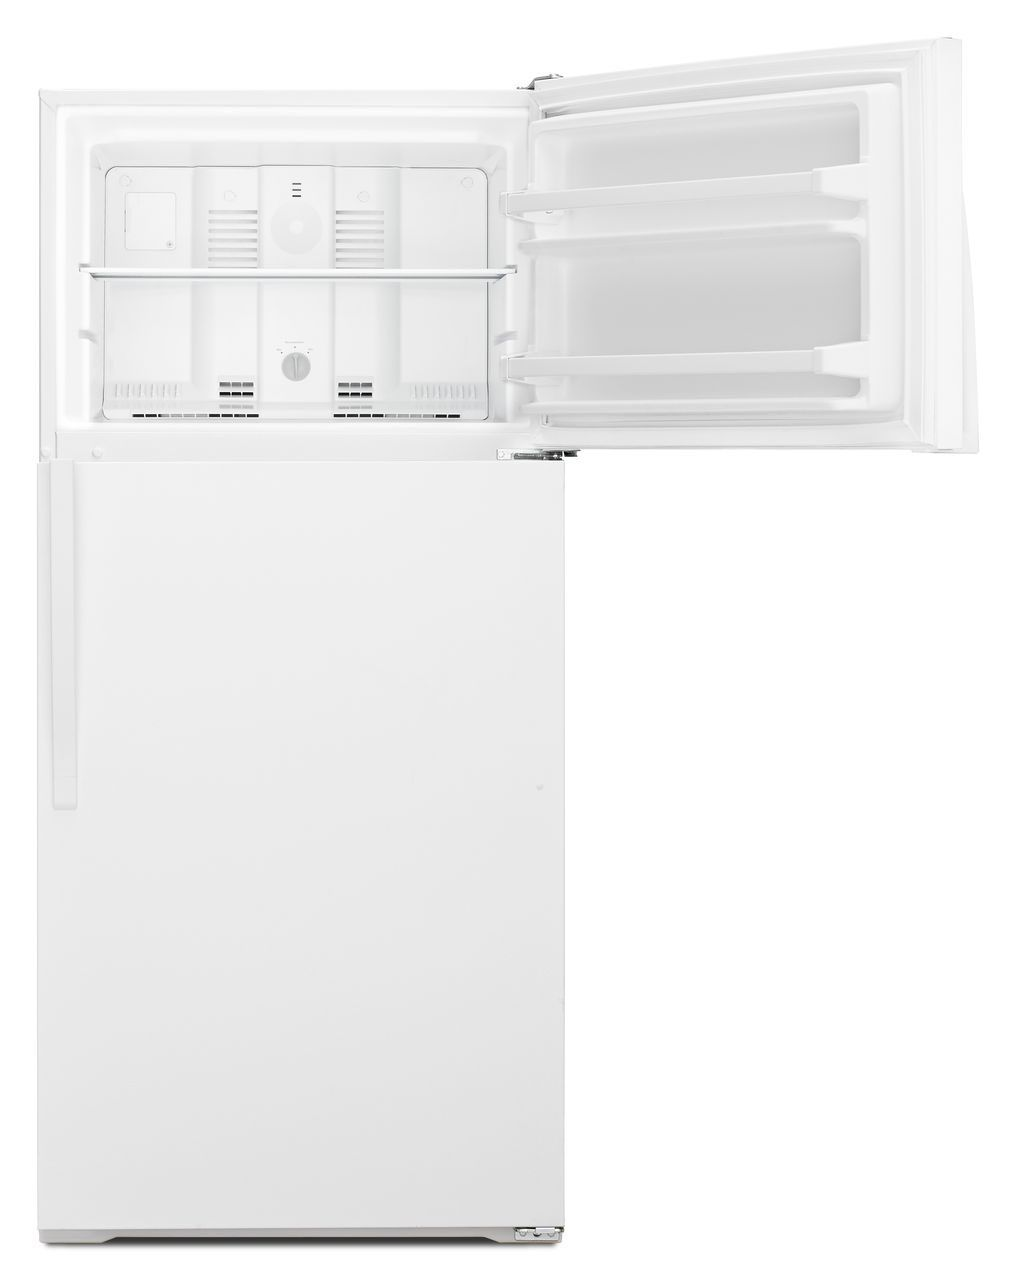 Whirlpool White Top-Freezer Refrigerator - WRT104TFDW